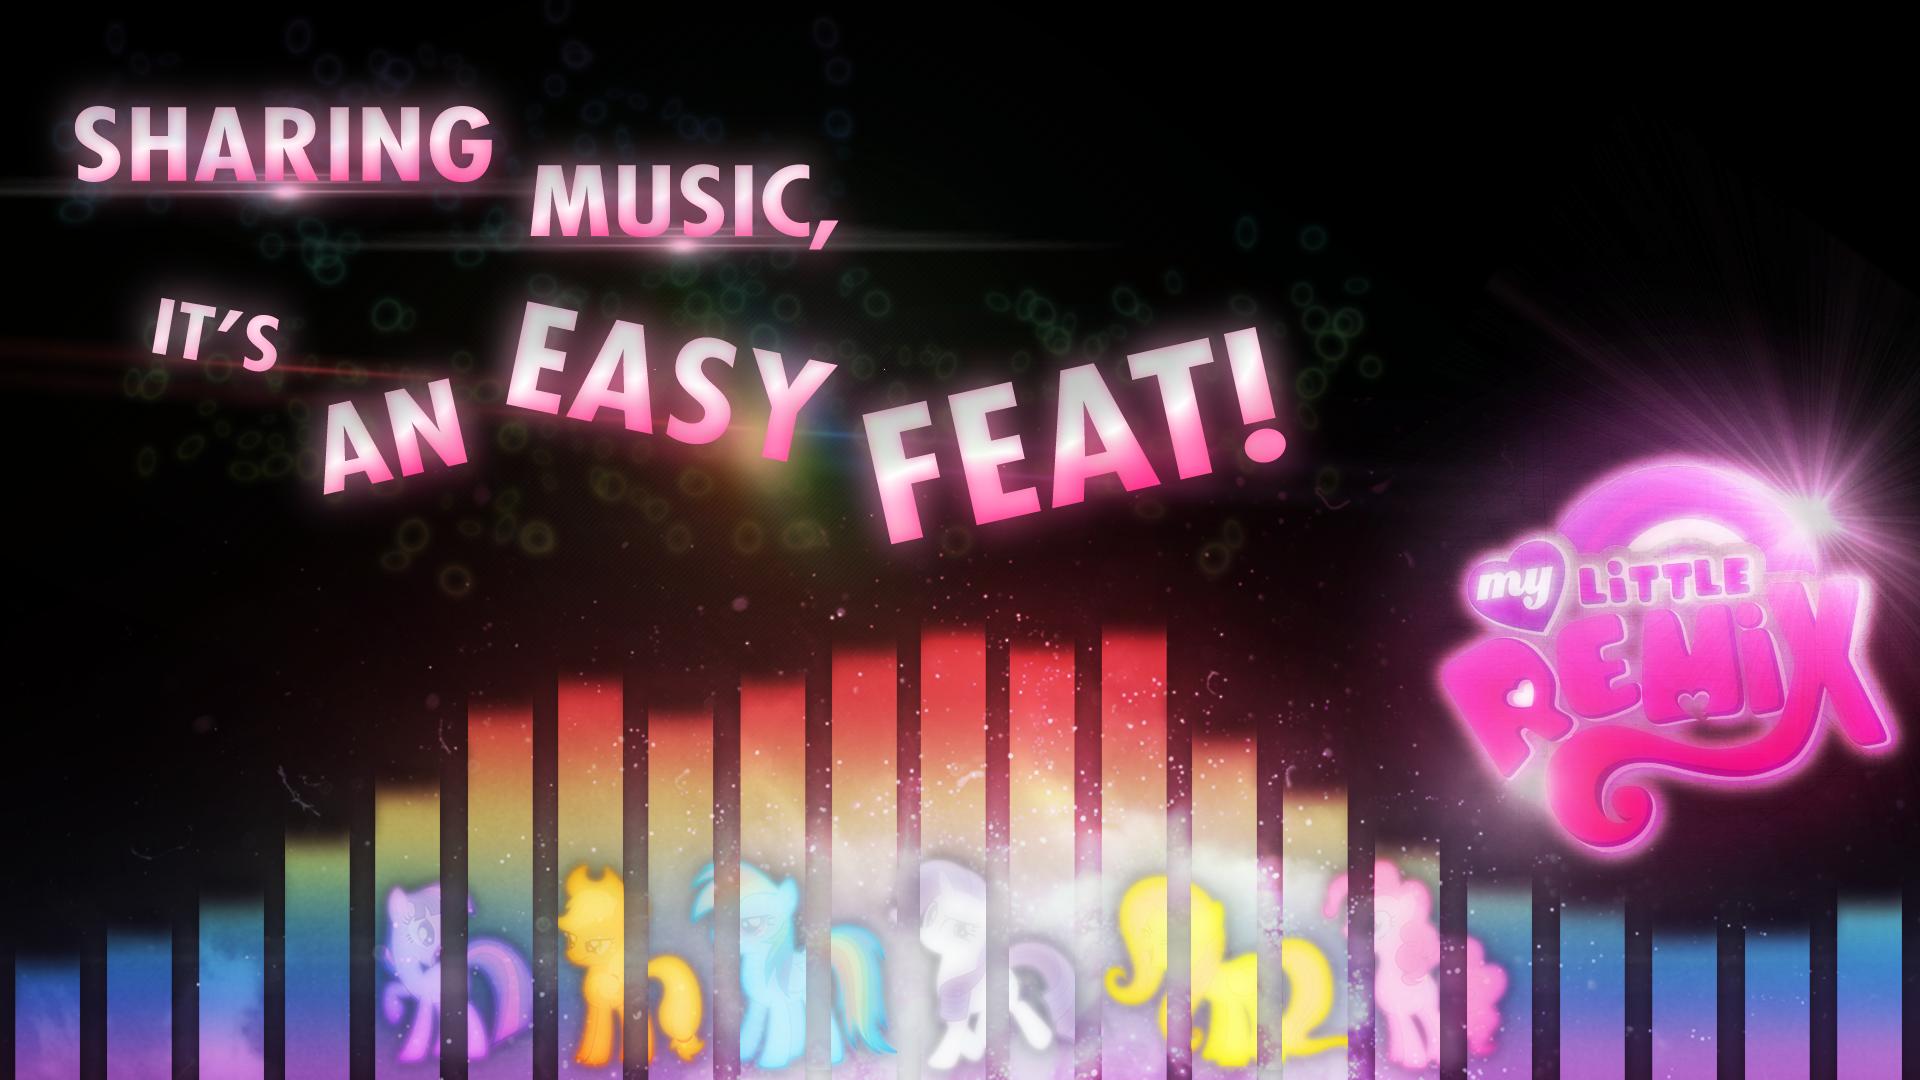 Sharing Music - MyLittleRemix by Austiniousi, FreeFraQ, Fureox, Hawk9mm, KibbieTheGreat, Makkon, xPesifeindx and Yanoda